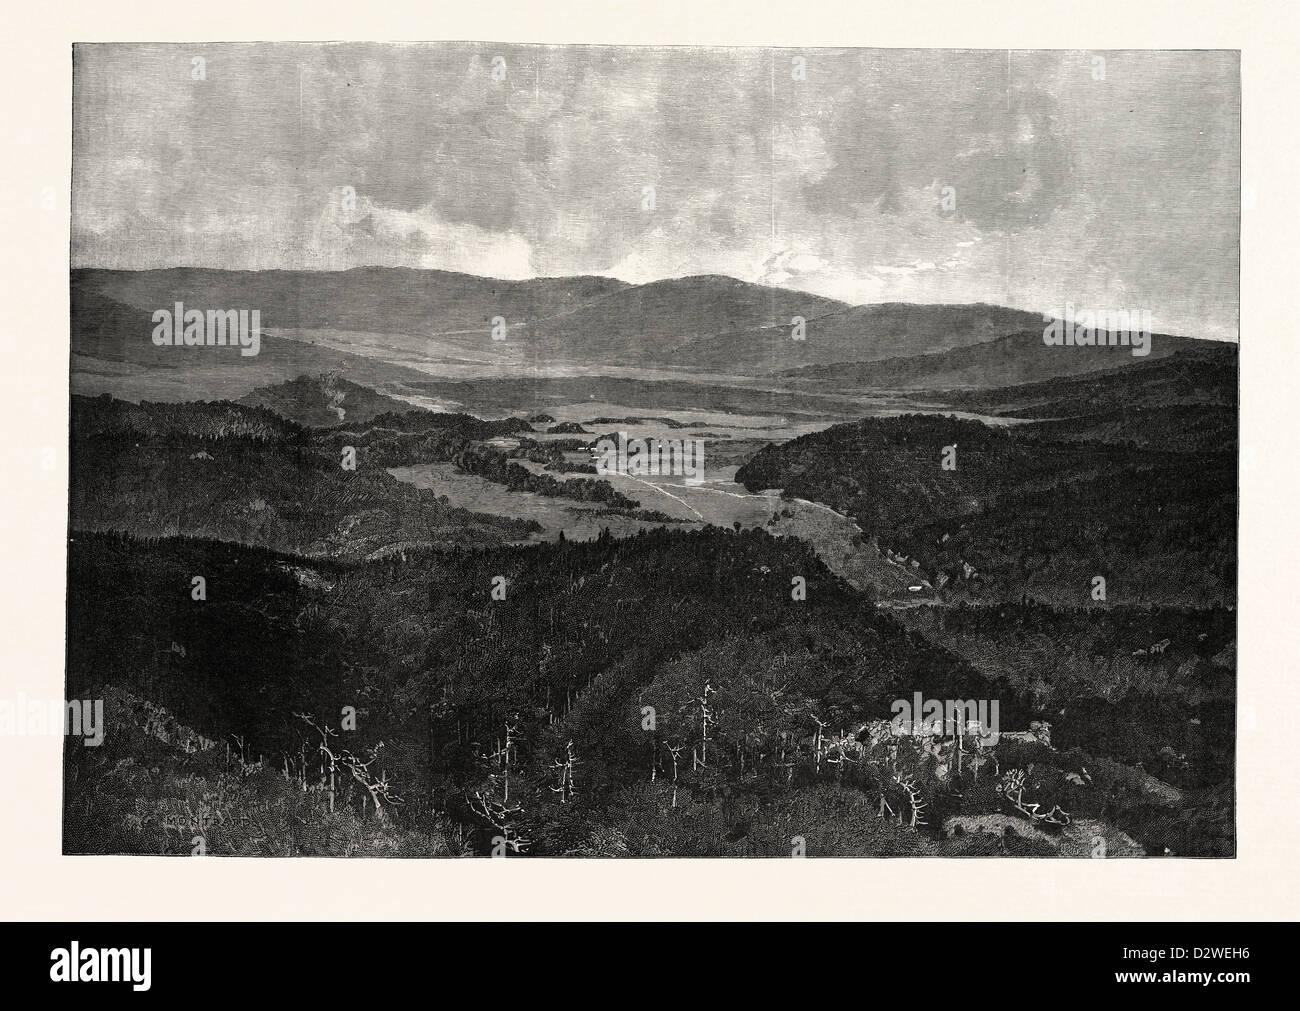 MIDDLESBOROUGH KENTUCKY IN 1889 USA - Stock Image